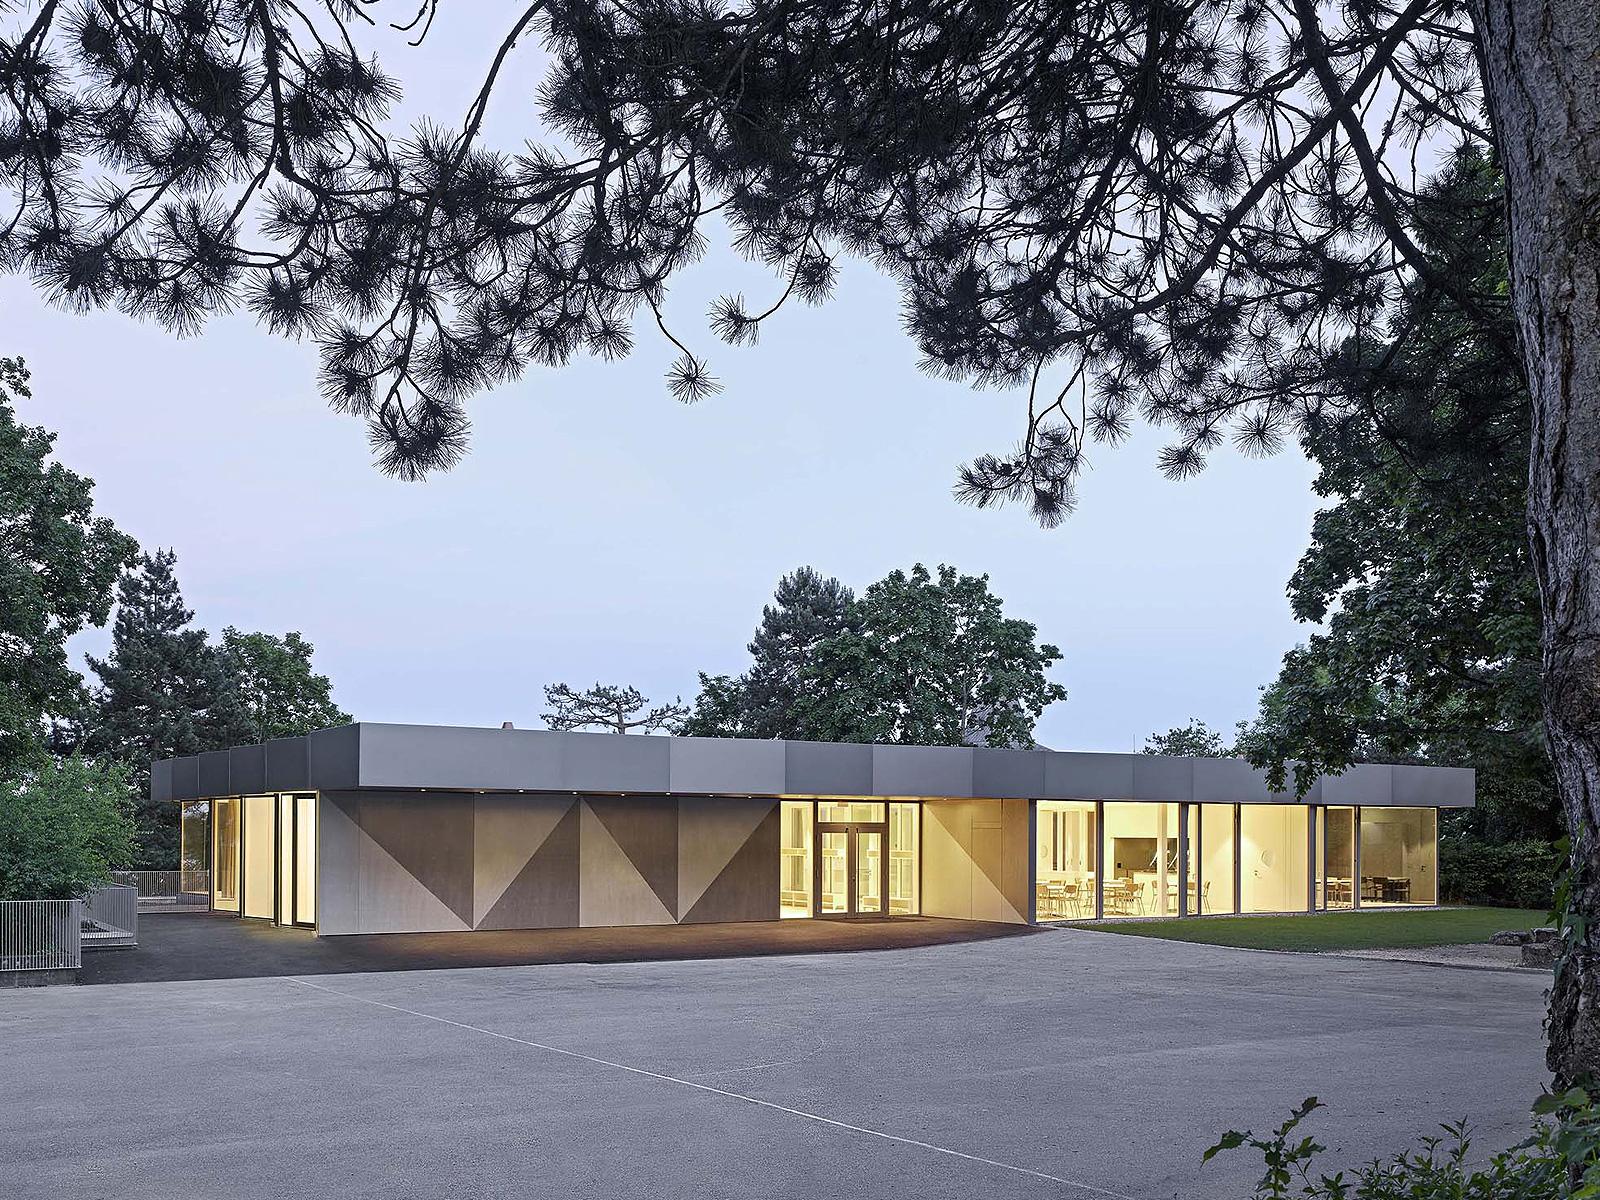 best architects architektur award bgm architekten gmbh bgm architekten gmbh tagesschule. Black Bedroom Furniture Sets. Home Design Ideas